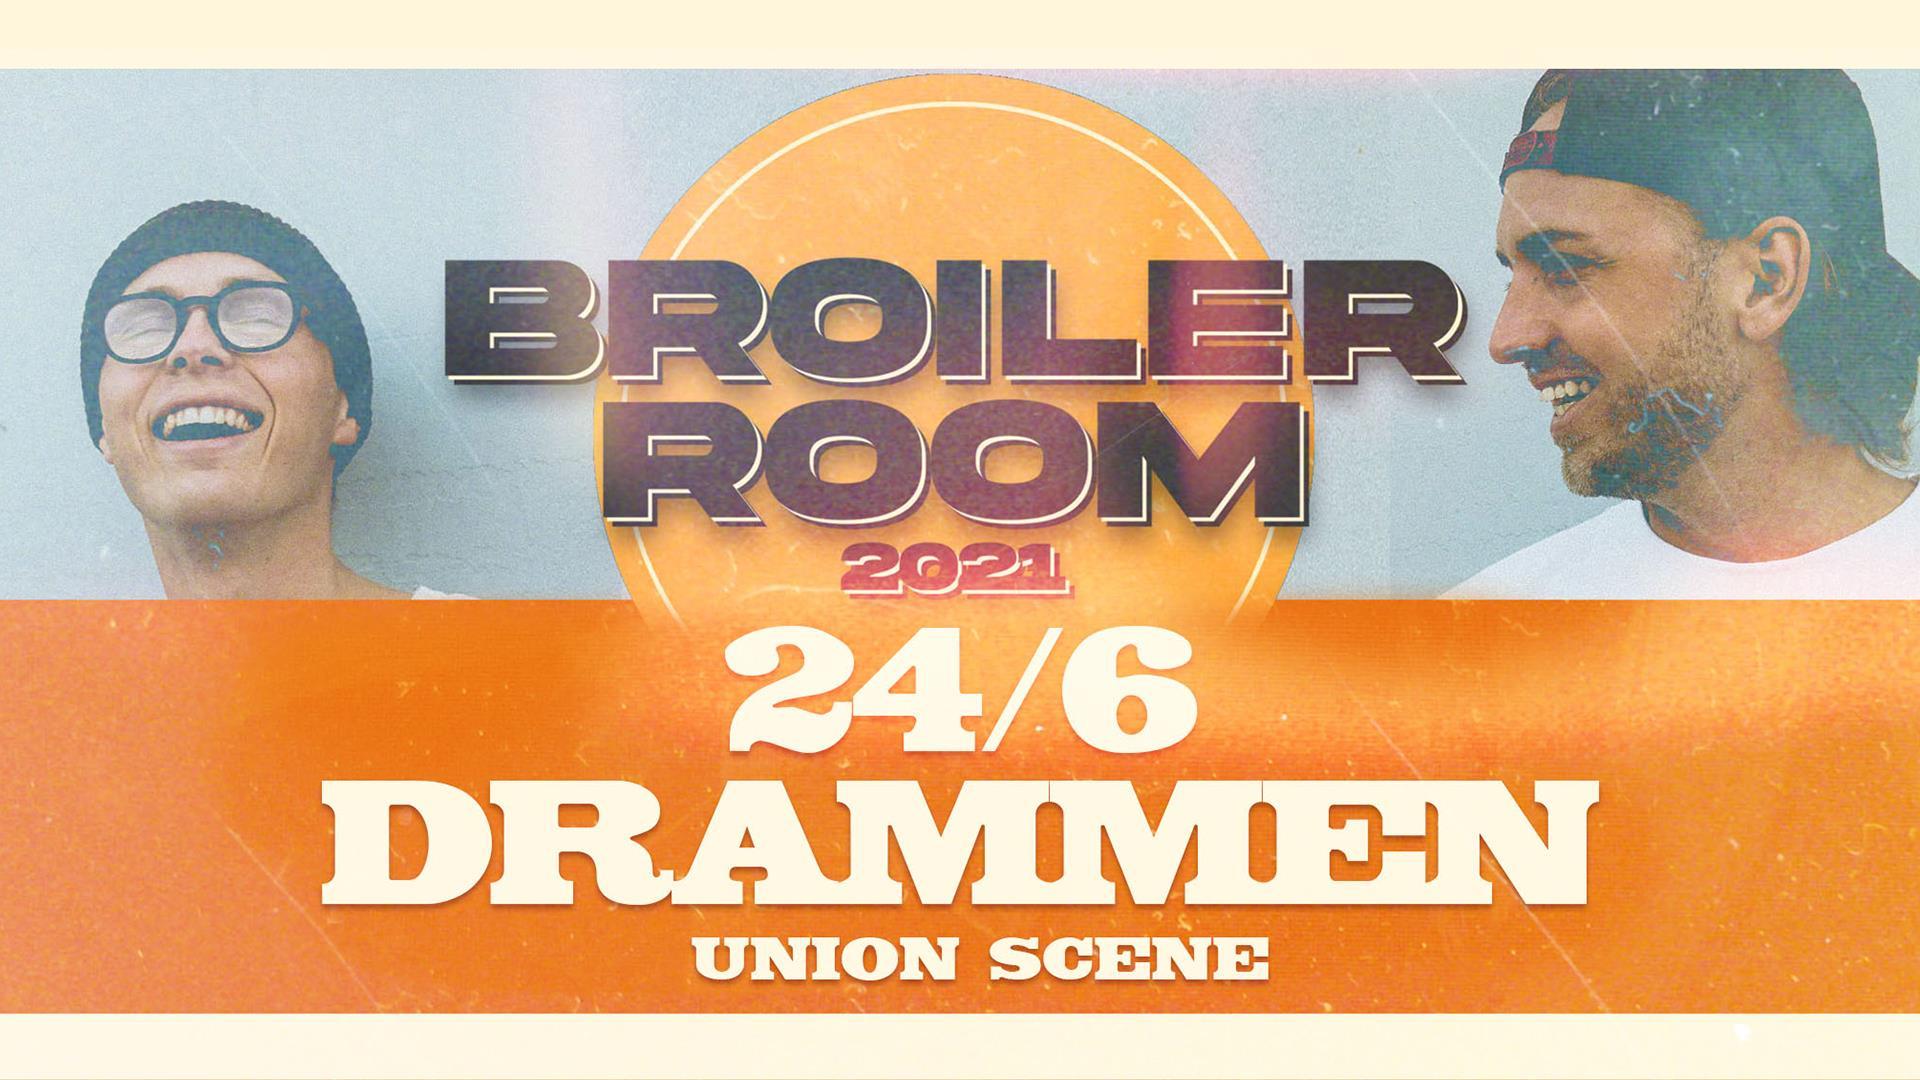 Broiler Room 2021